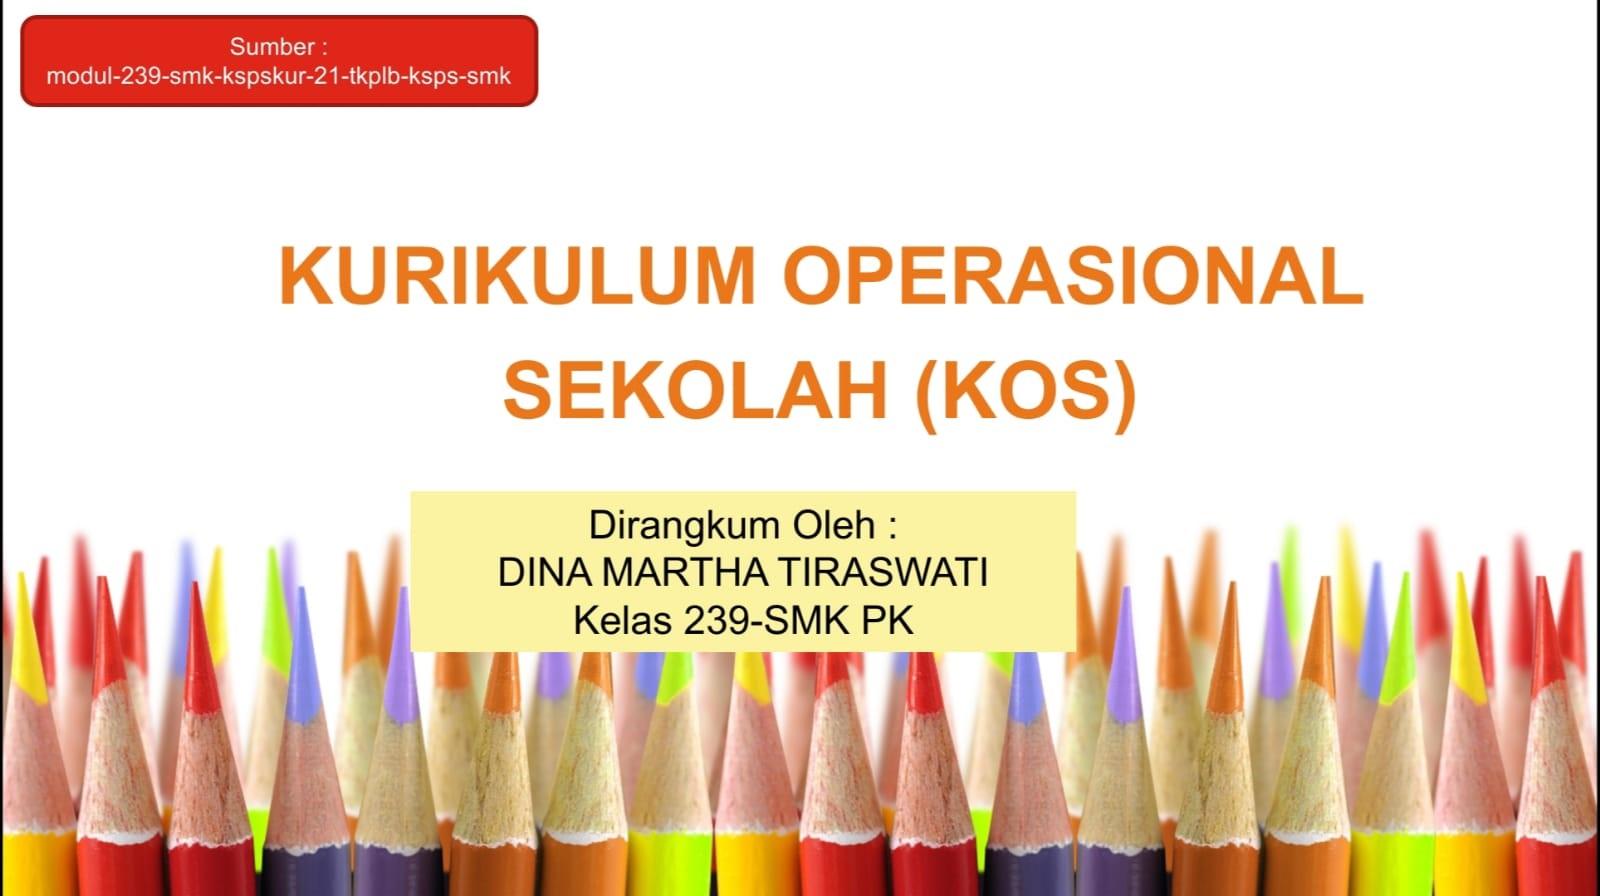 Penyusunan Kurikulum Operasional Sekolah